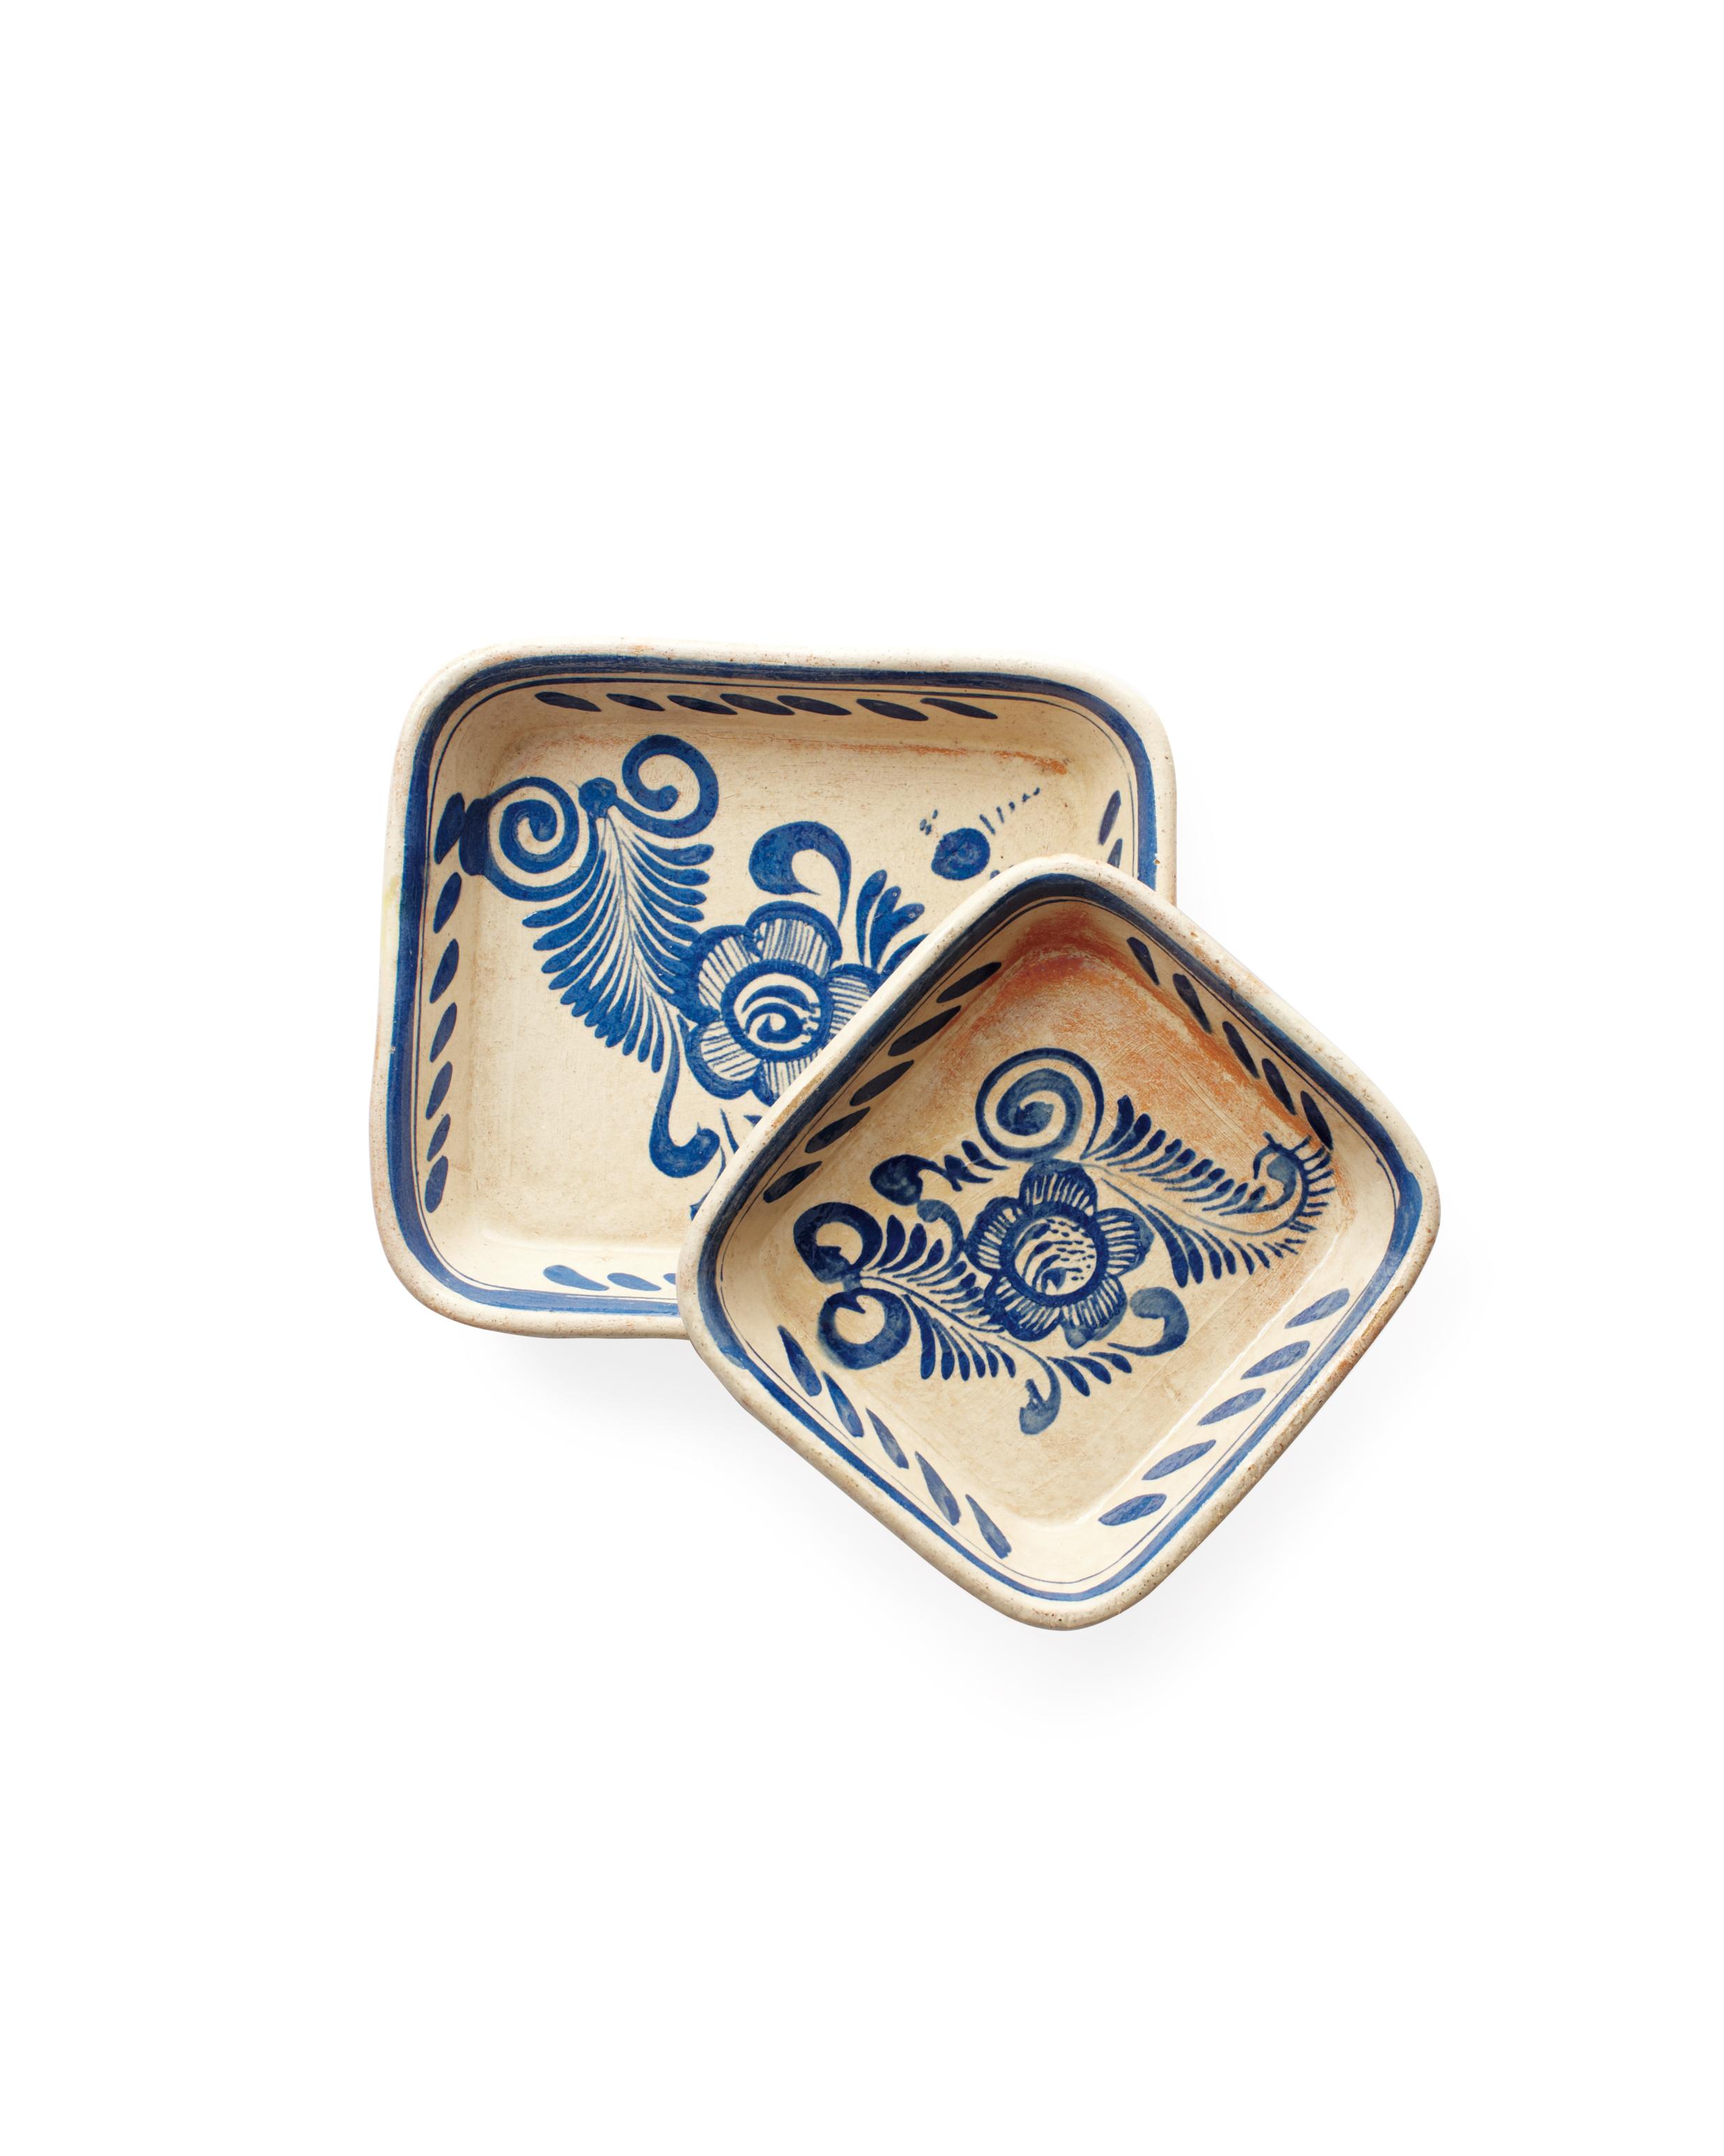 mexican-bowls-001-md108883.jpg